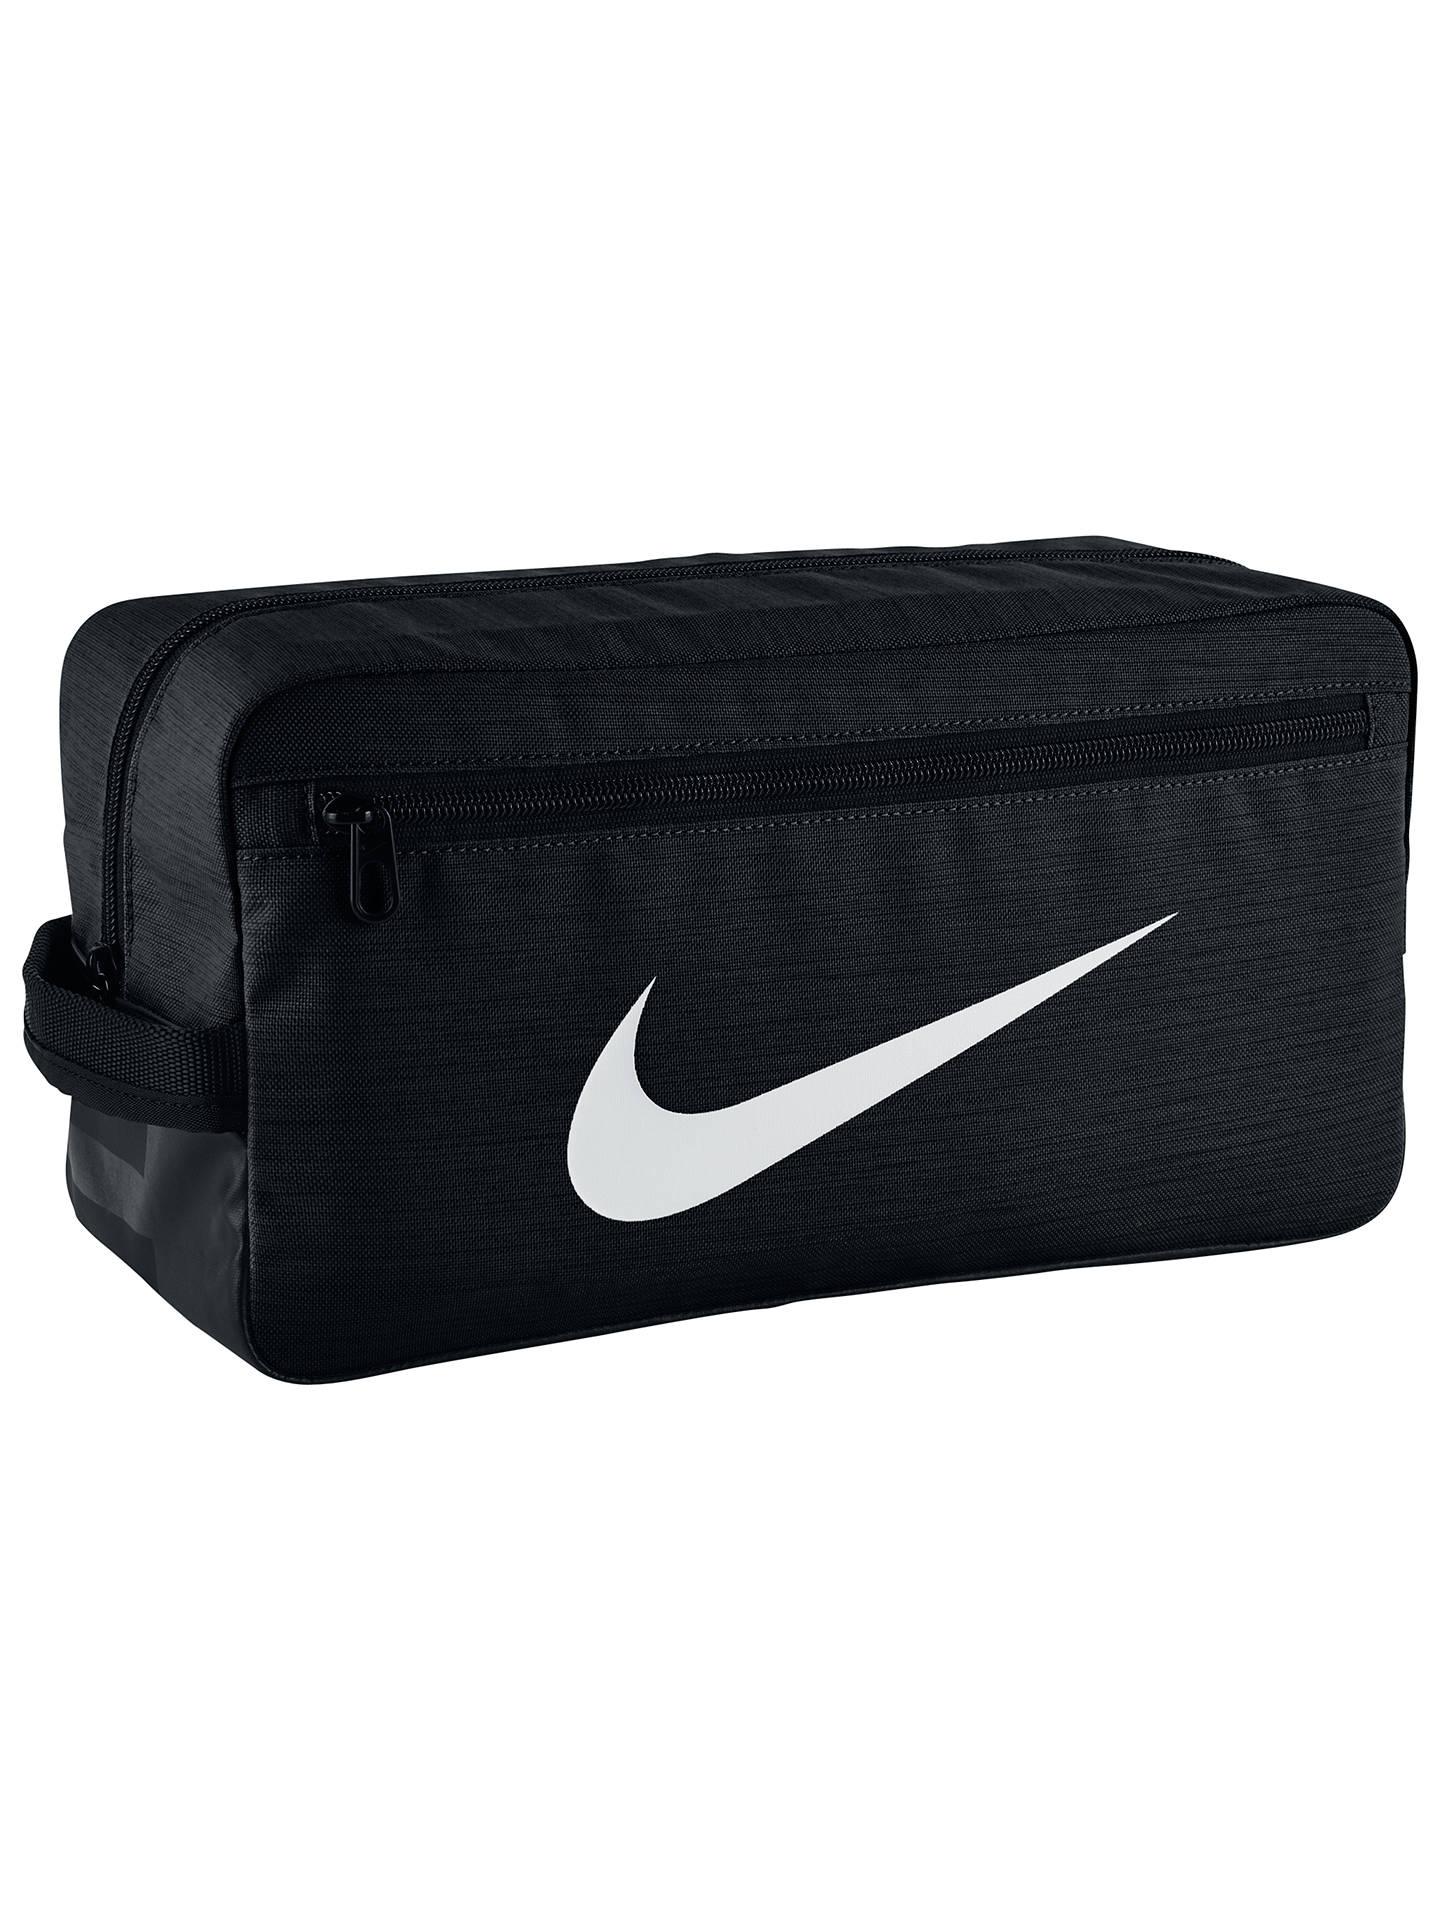 e9a0cadfee36 BuyNike Brasilia Training Shoe Bag